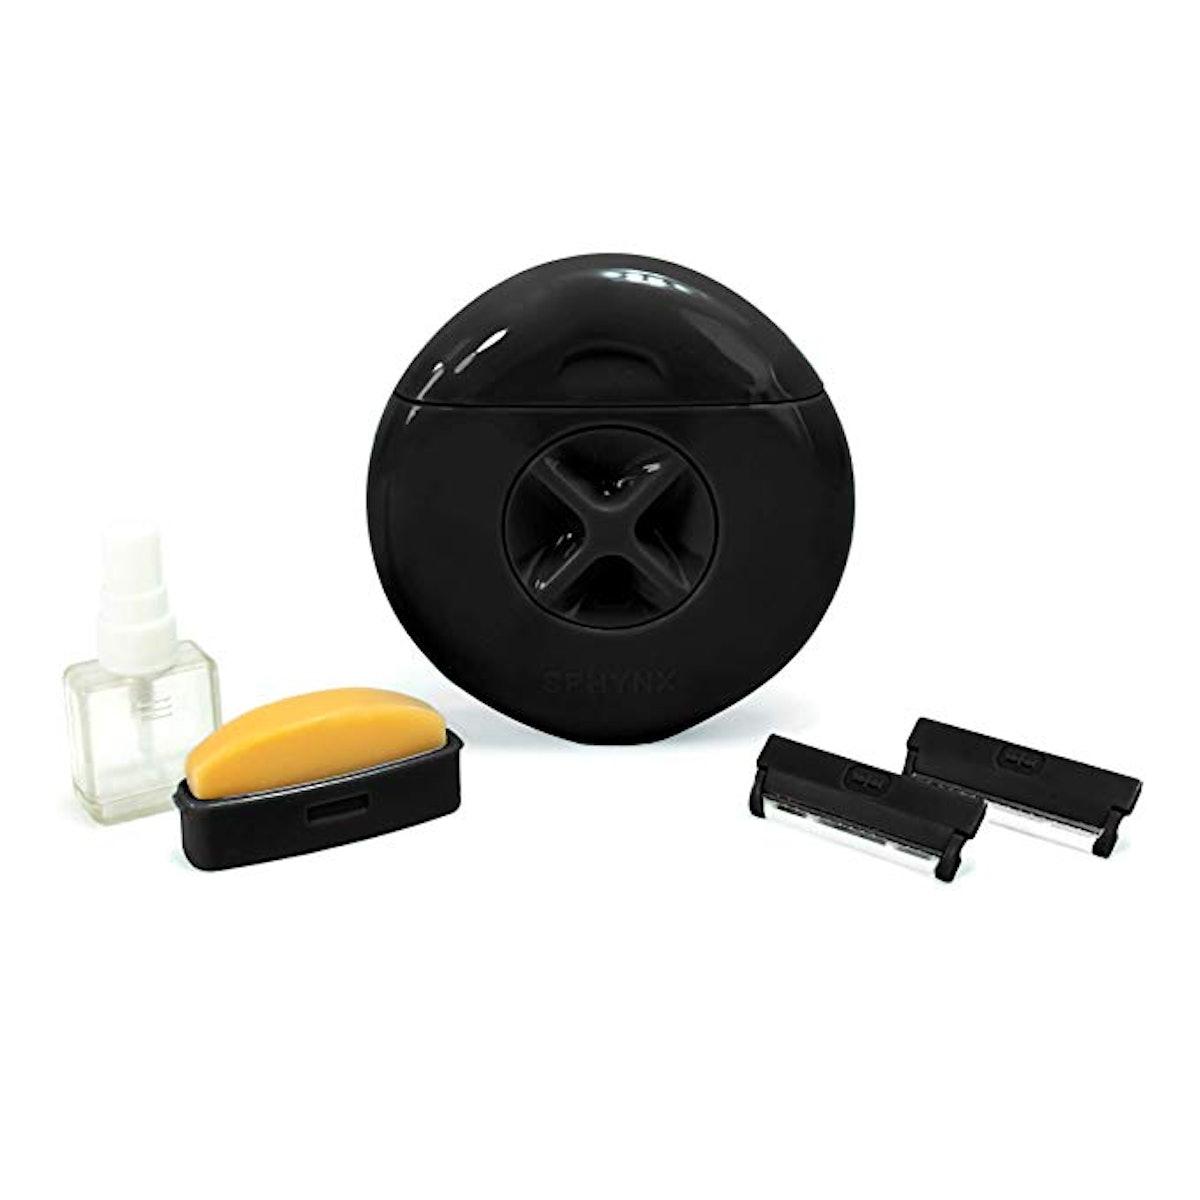 Sphynx Portable Razor Kit